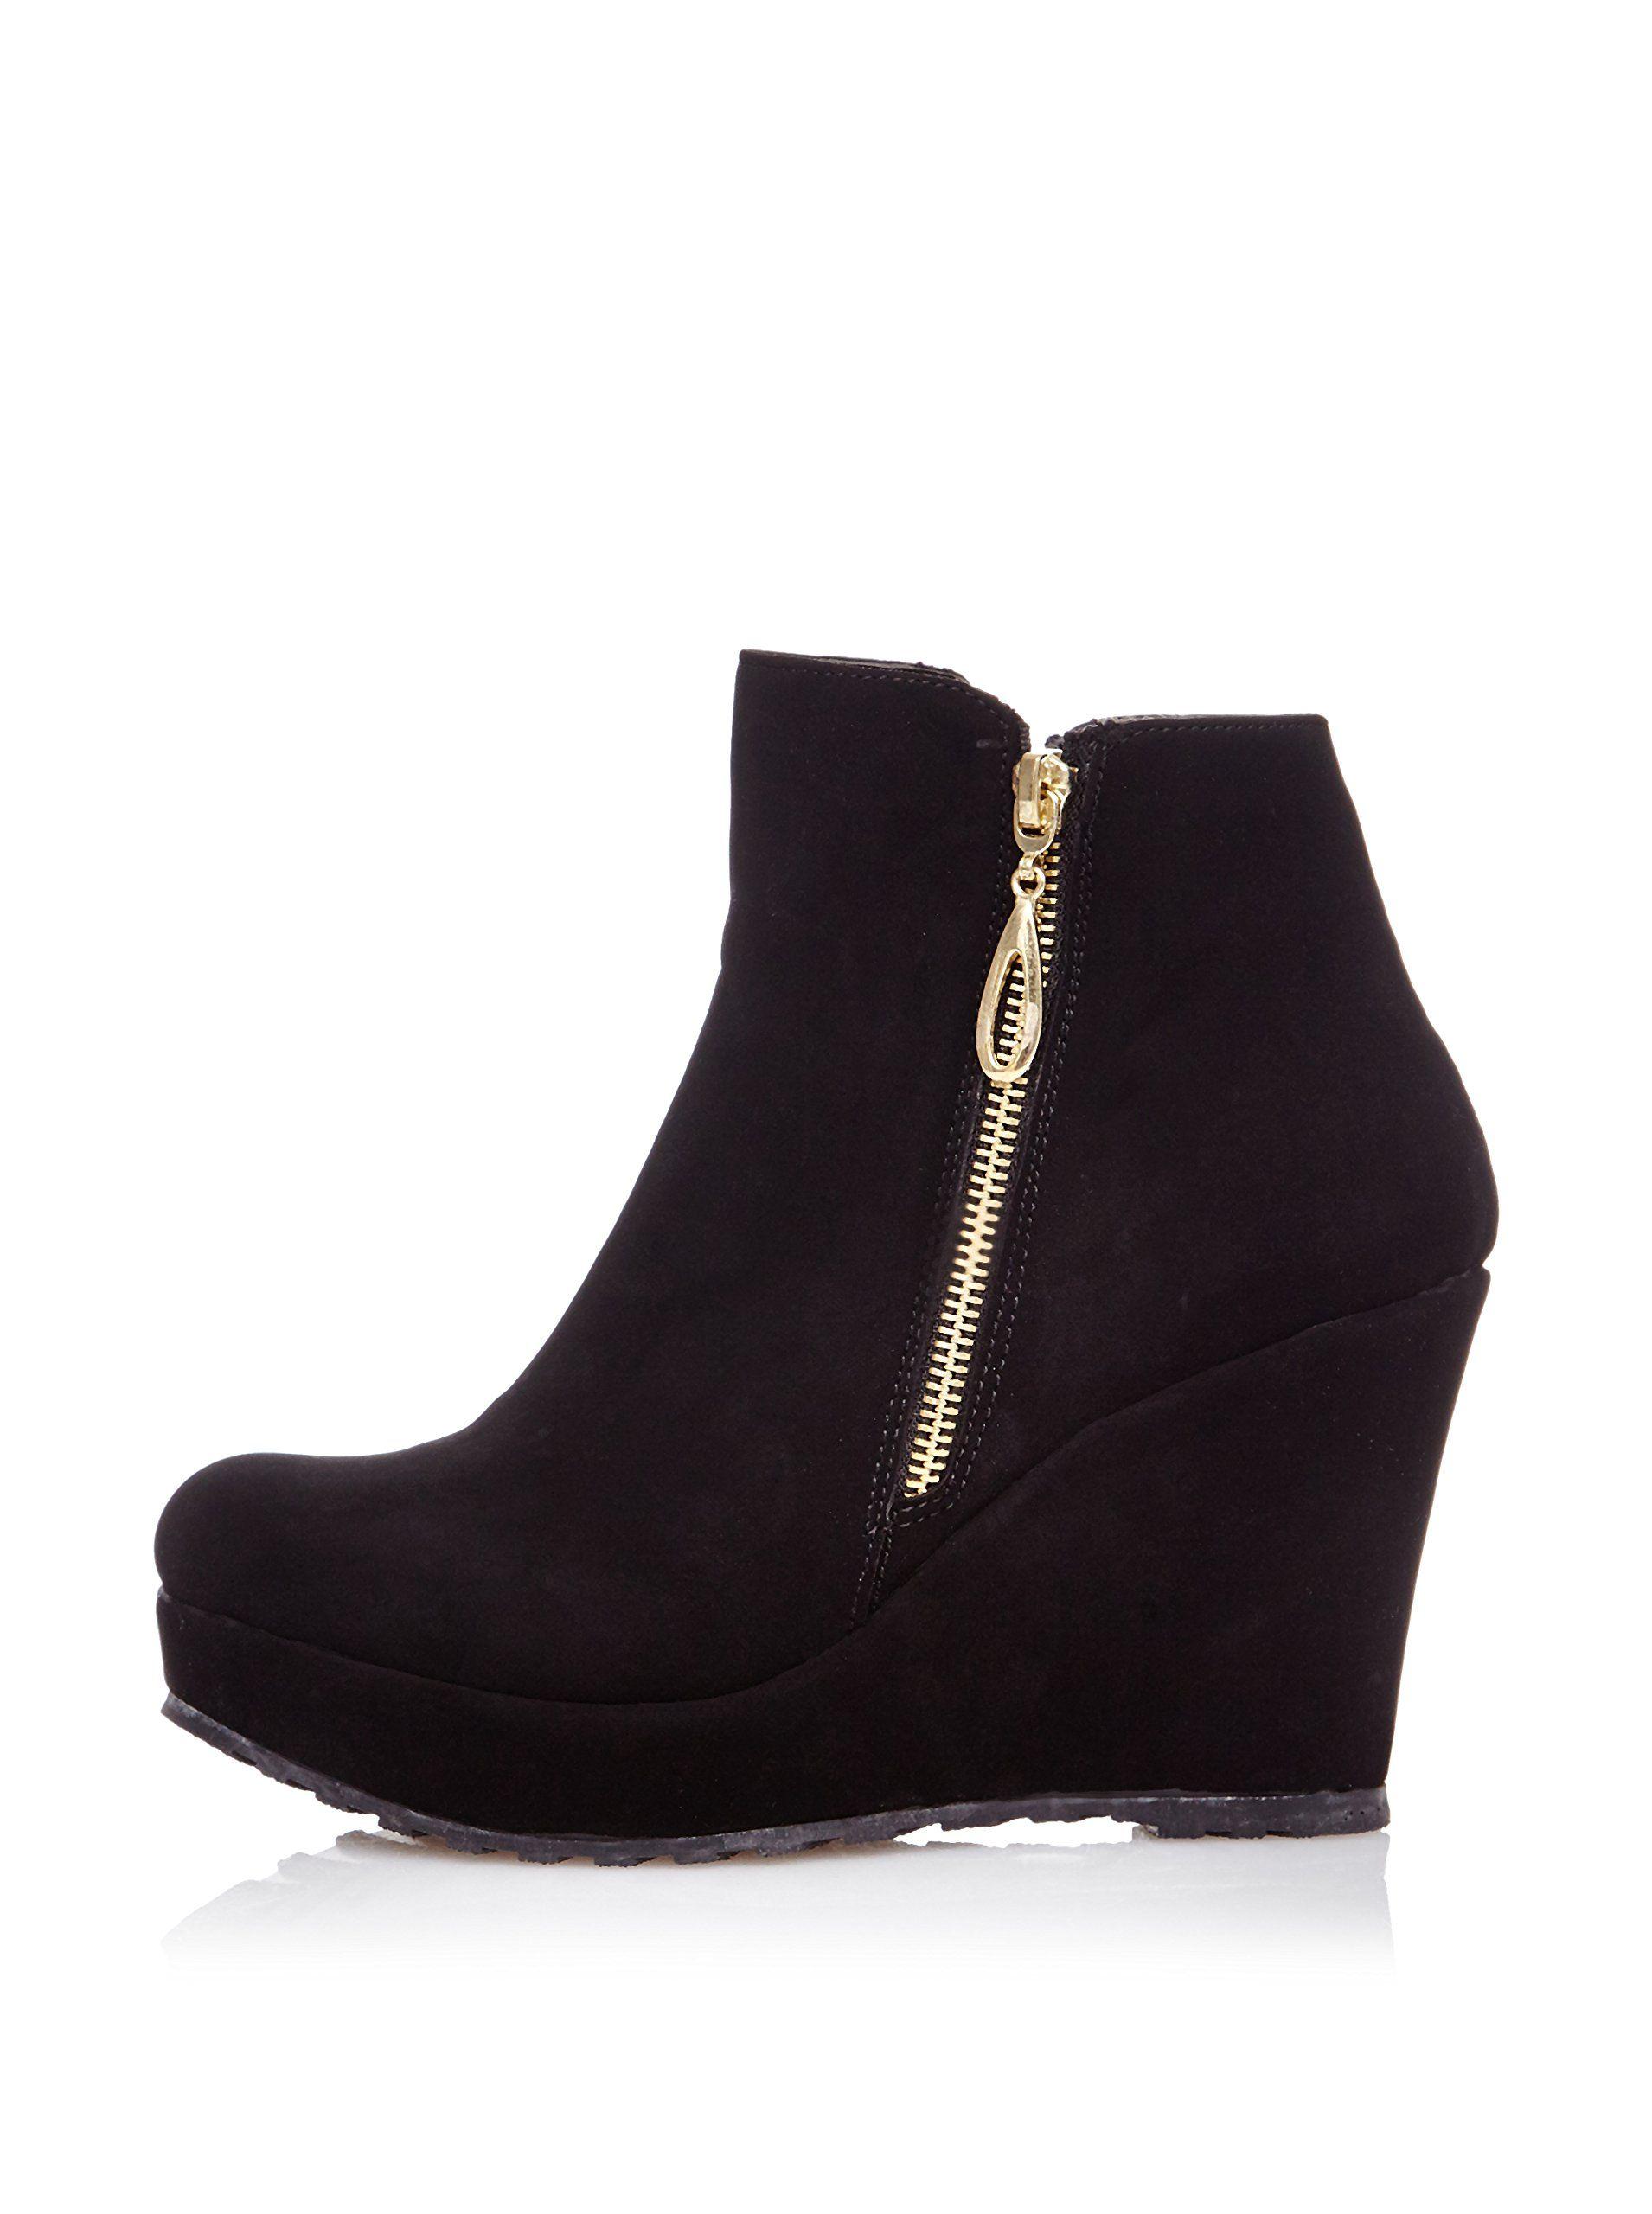 0a36260b0 Shoes Time Botines Cuña en Amazon BuyVIP